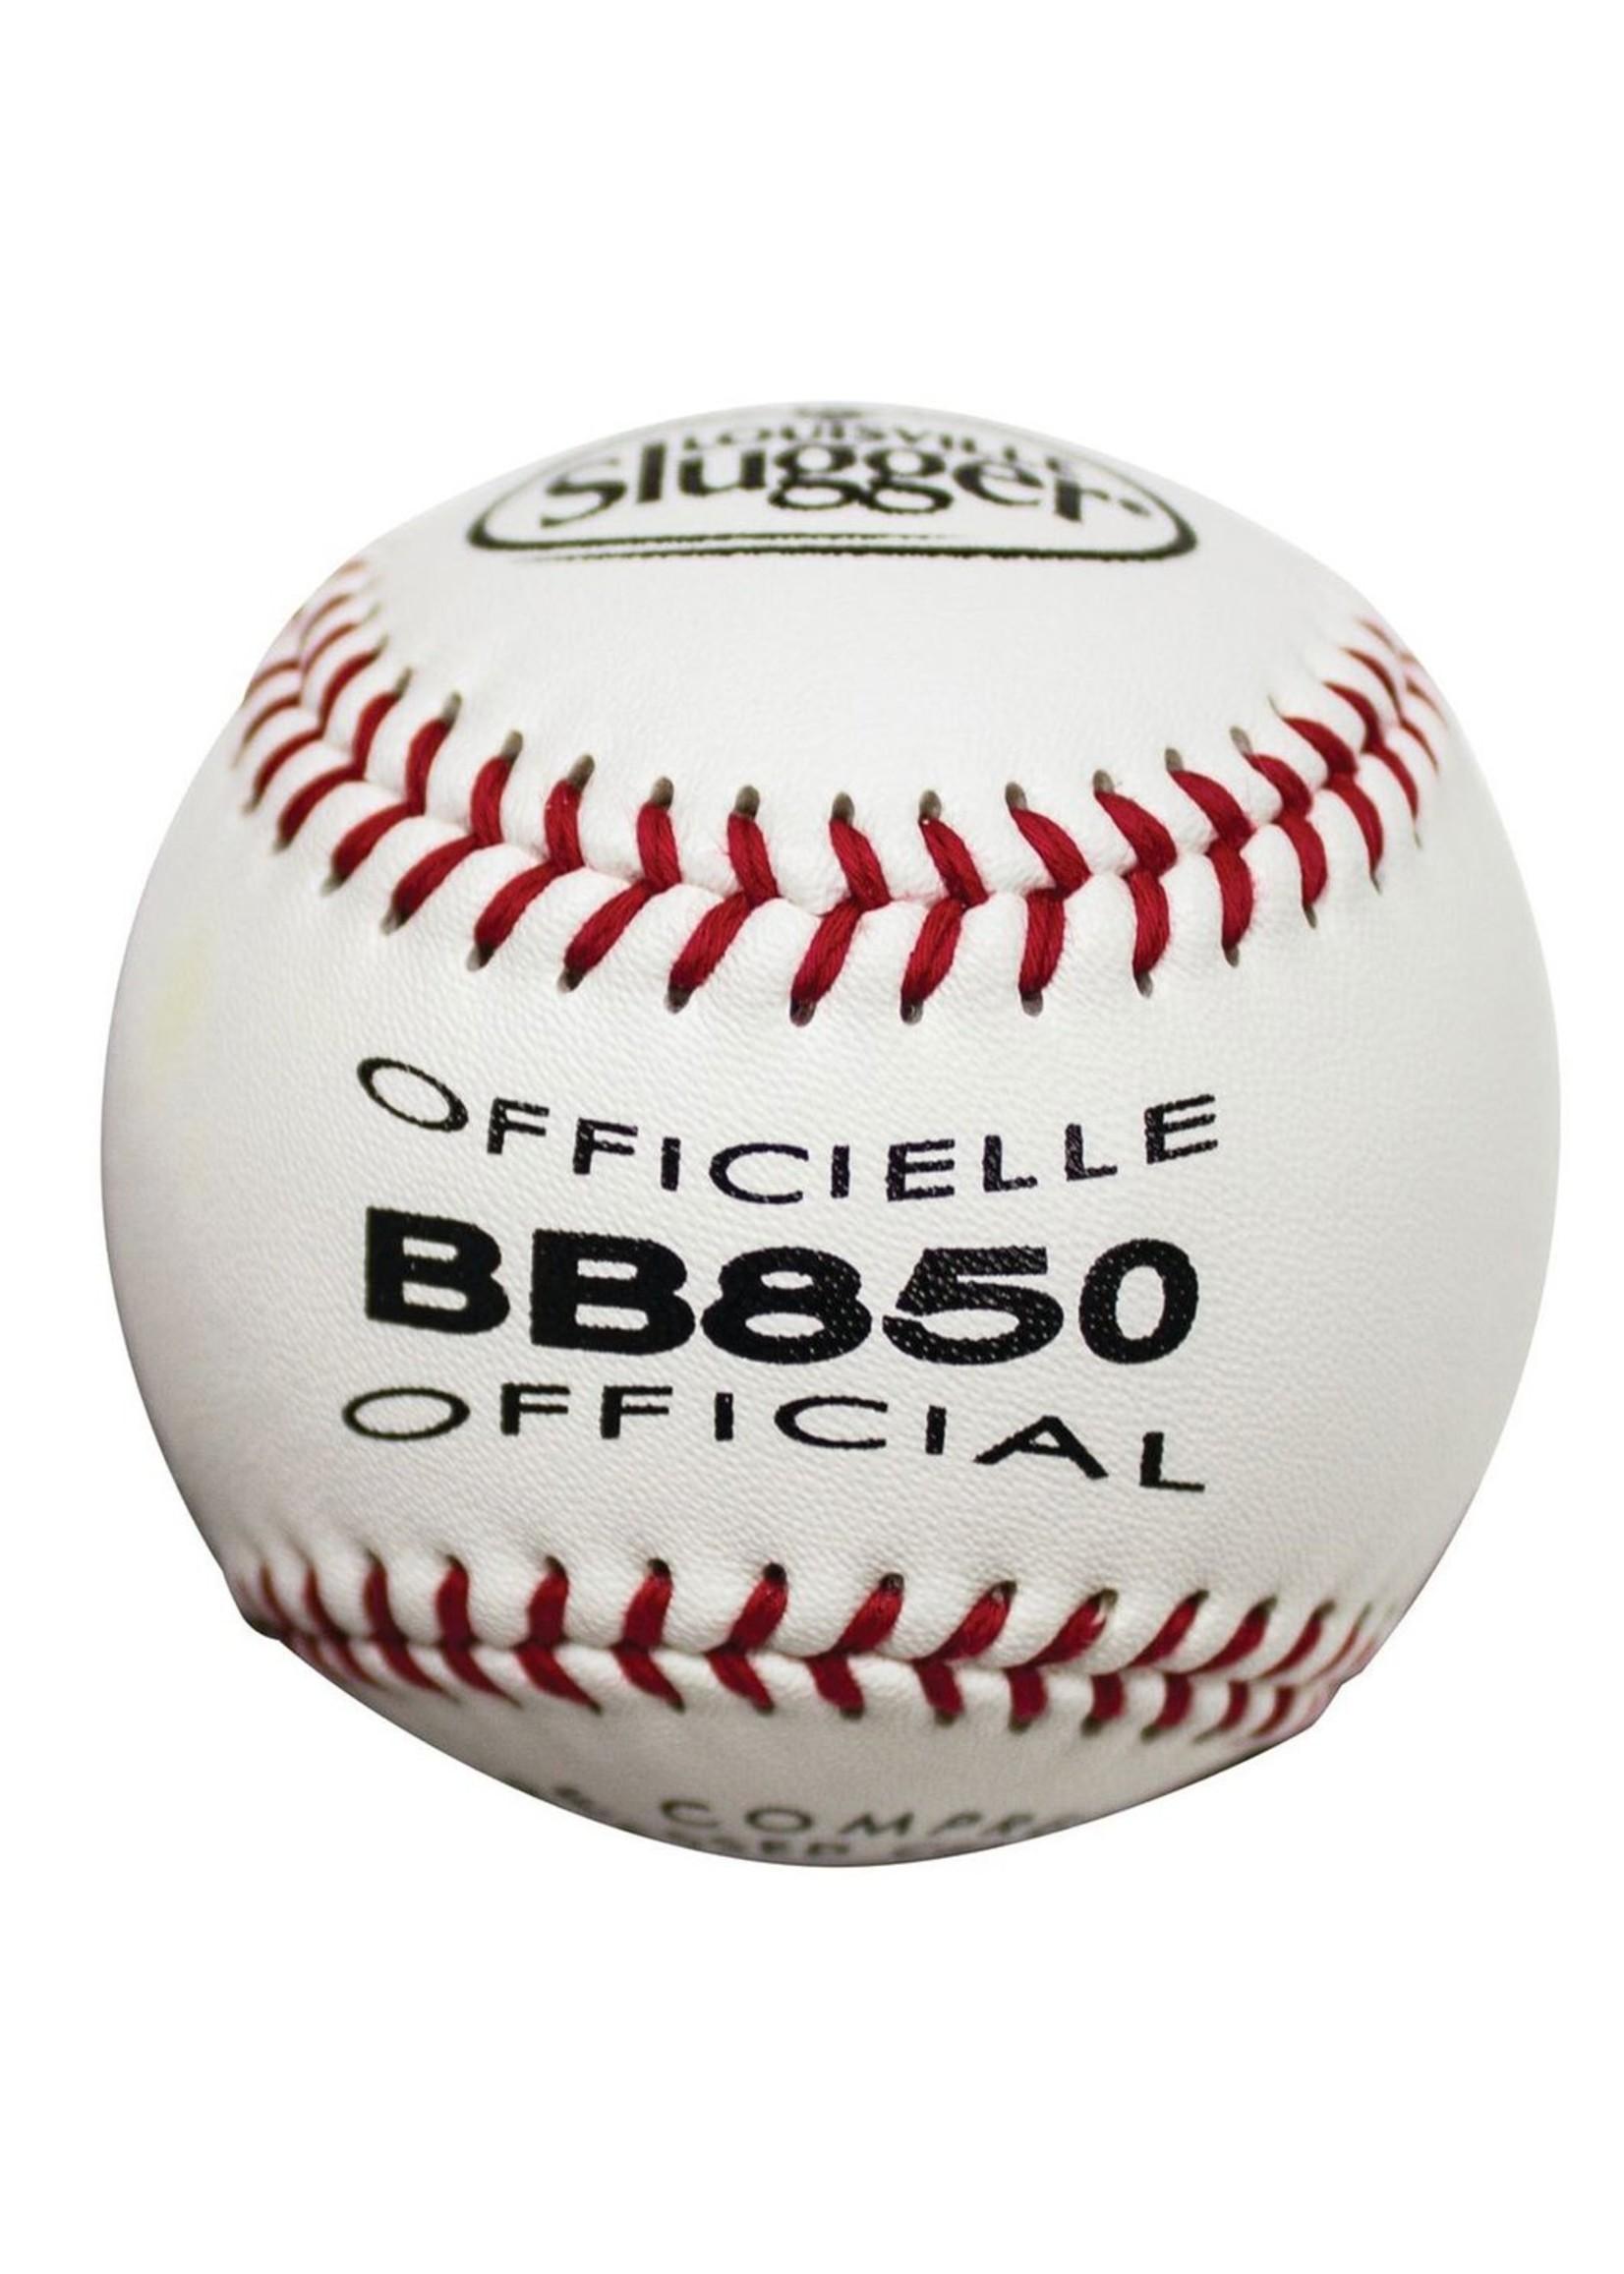 "Louisville (Canada) LOUISVILLE BB850 8.5"" BOX OF 12 BASEBALL"